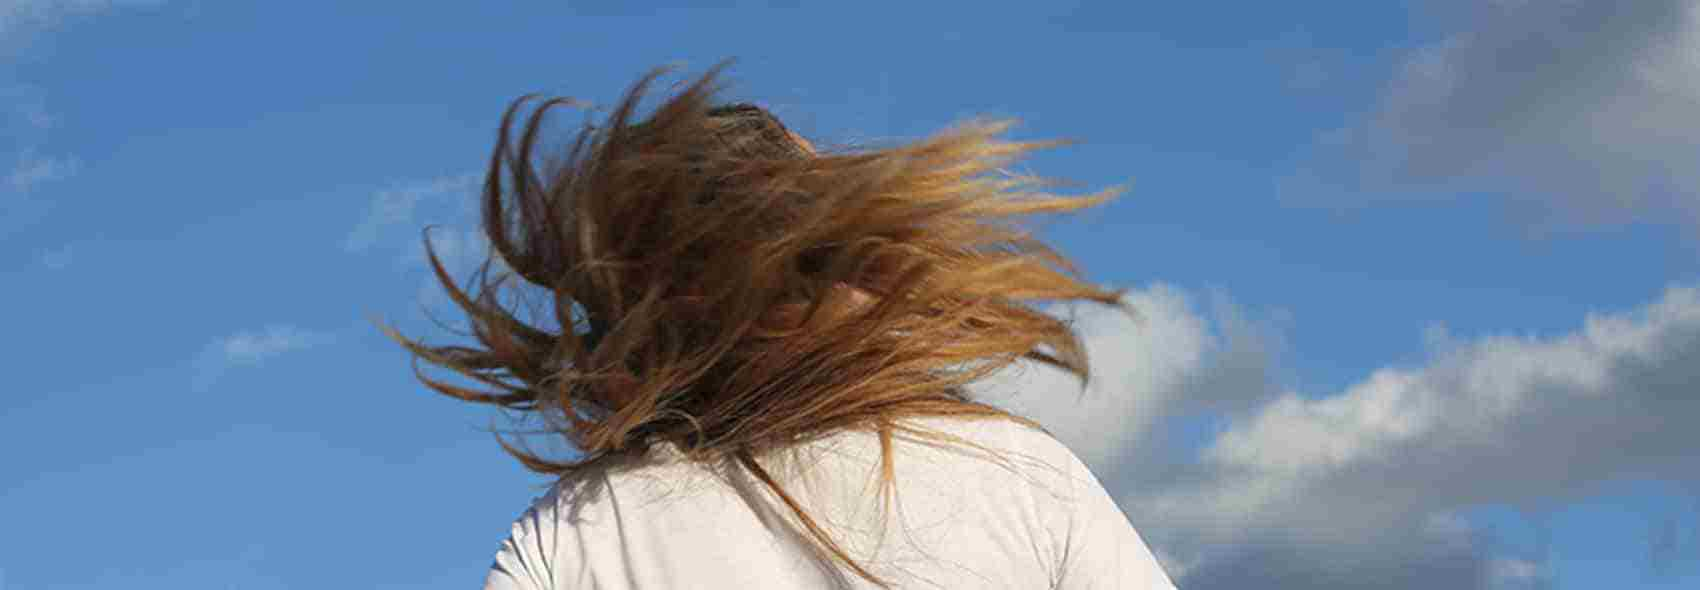 Inflammation hait in wind